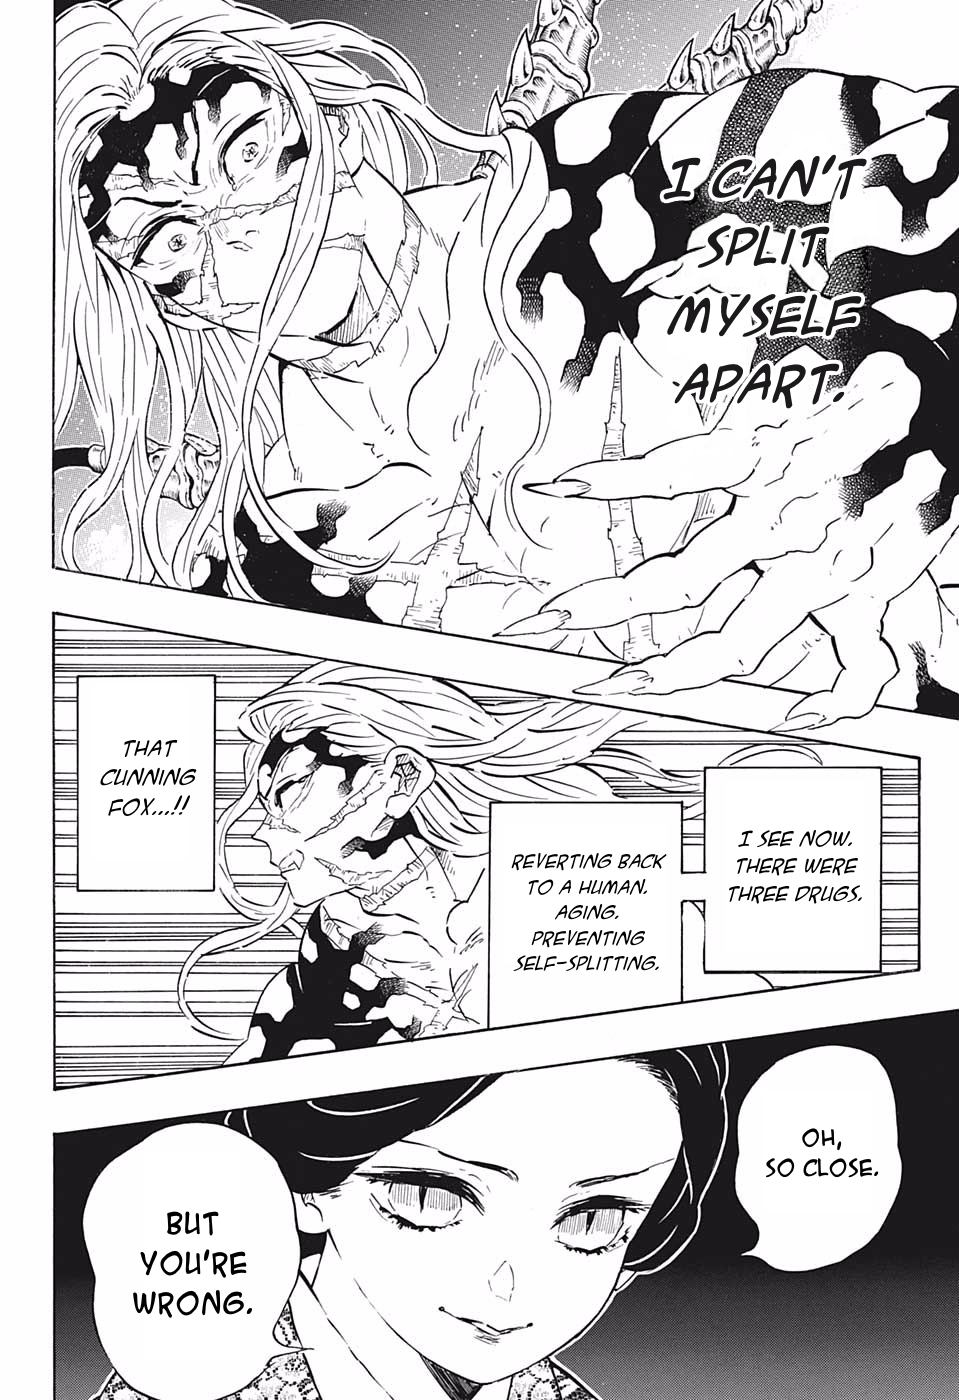 Demon Slayer Kimetsu No Yaiba Chapter 196 In 2020 Slayer Anime Slayer Manga